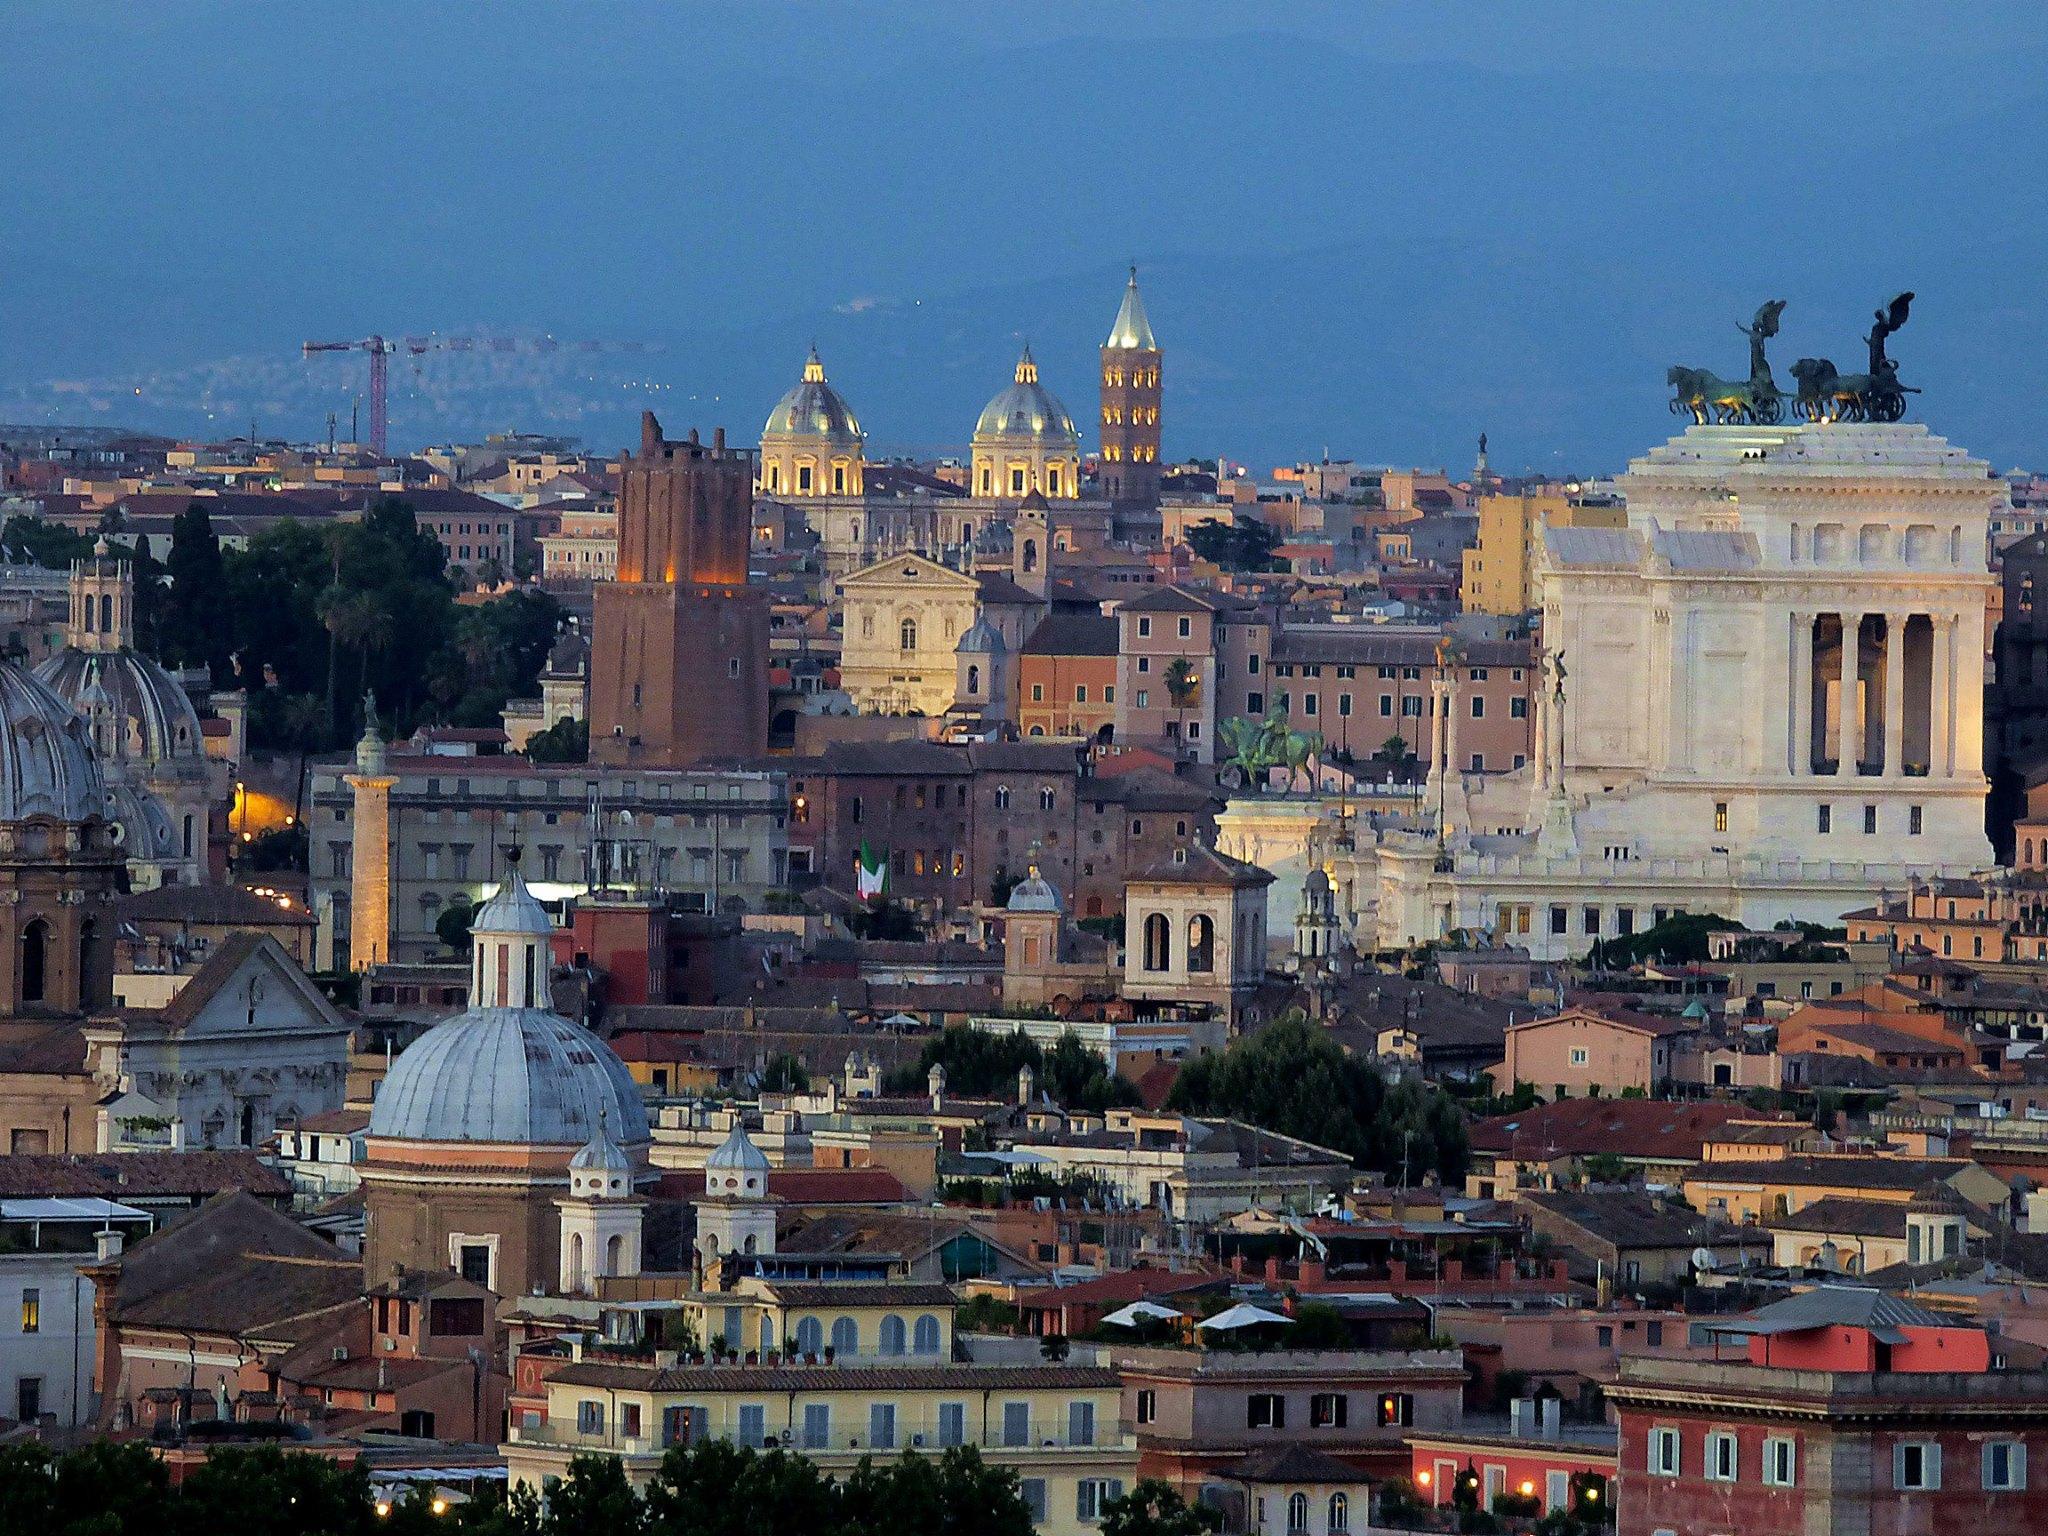 meteo roma - photo #5